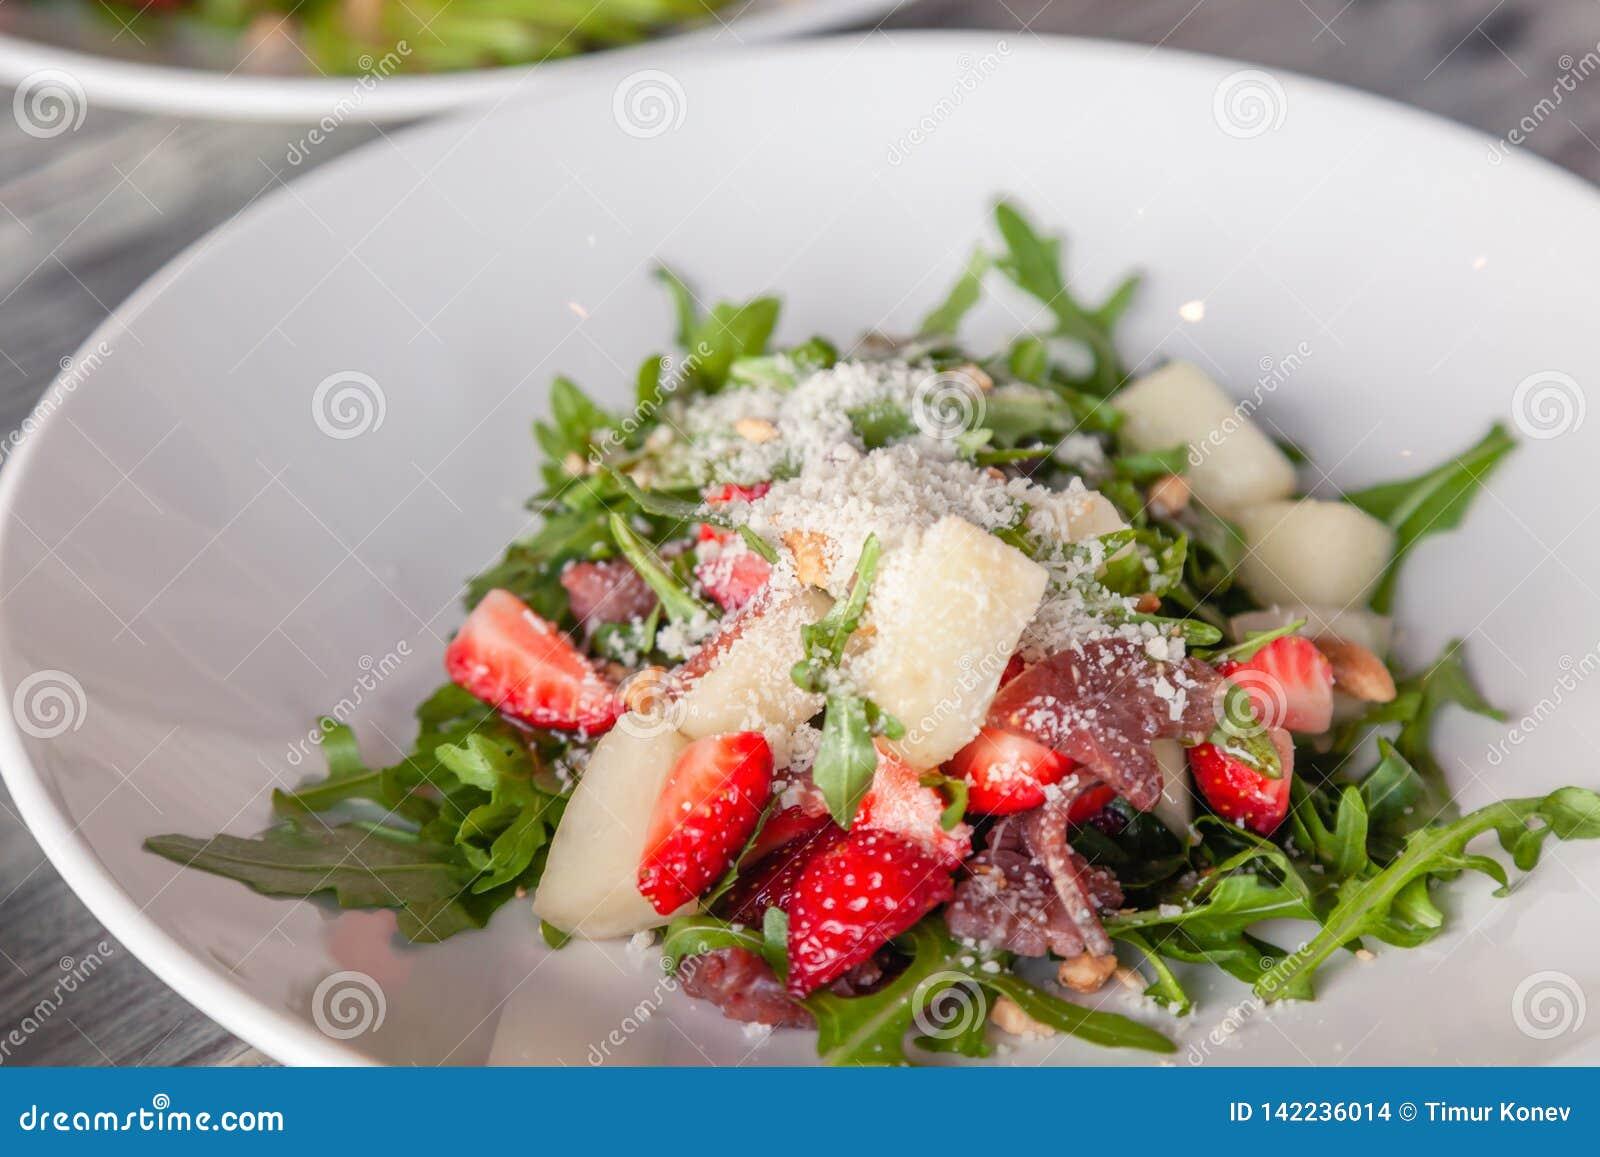 Close-up fresh summer salad with basturma jerky, greens, arugula, strawberries, melon, parmesan cheese. Concept delicacy, new menu